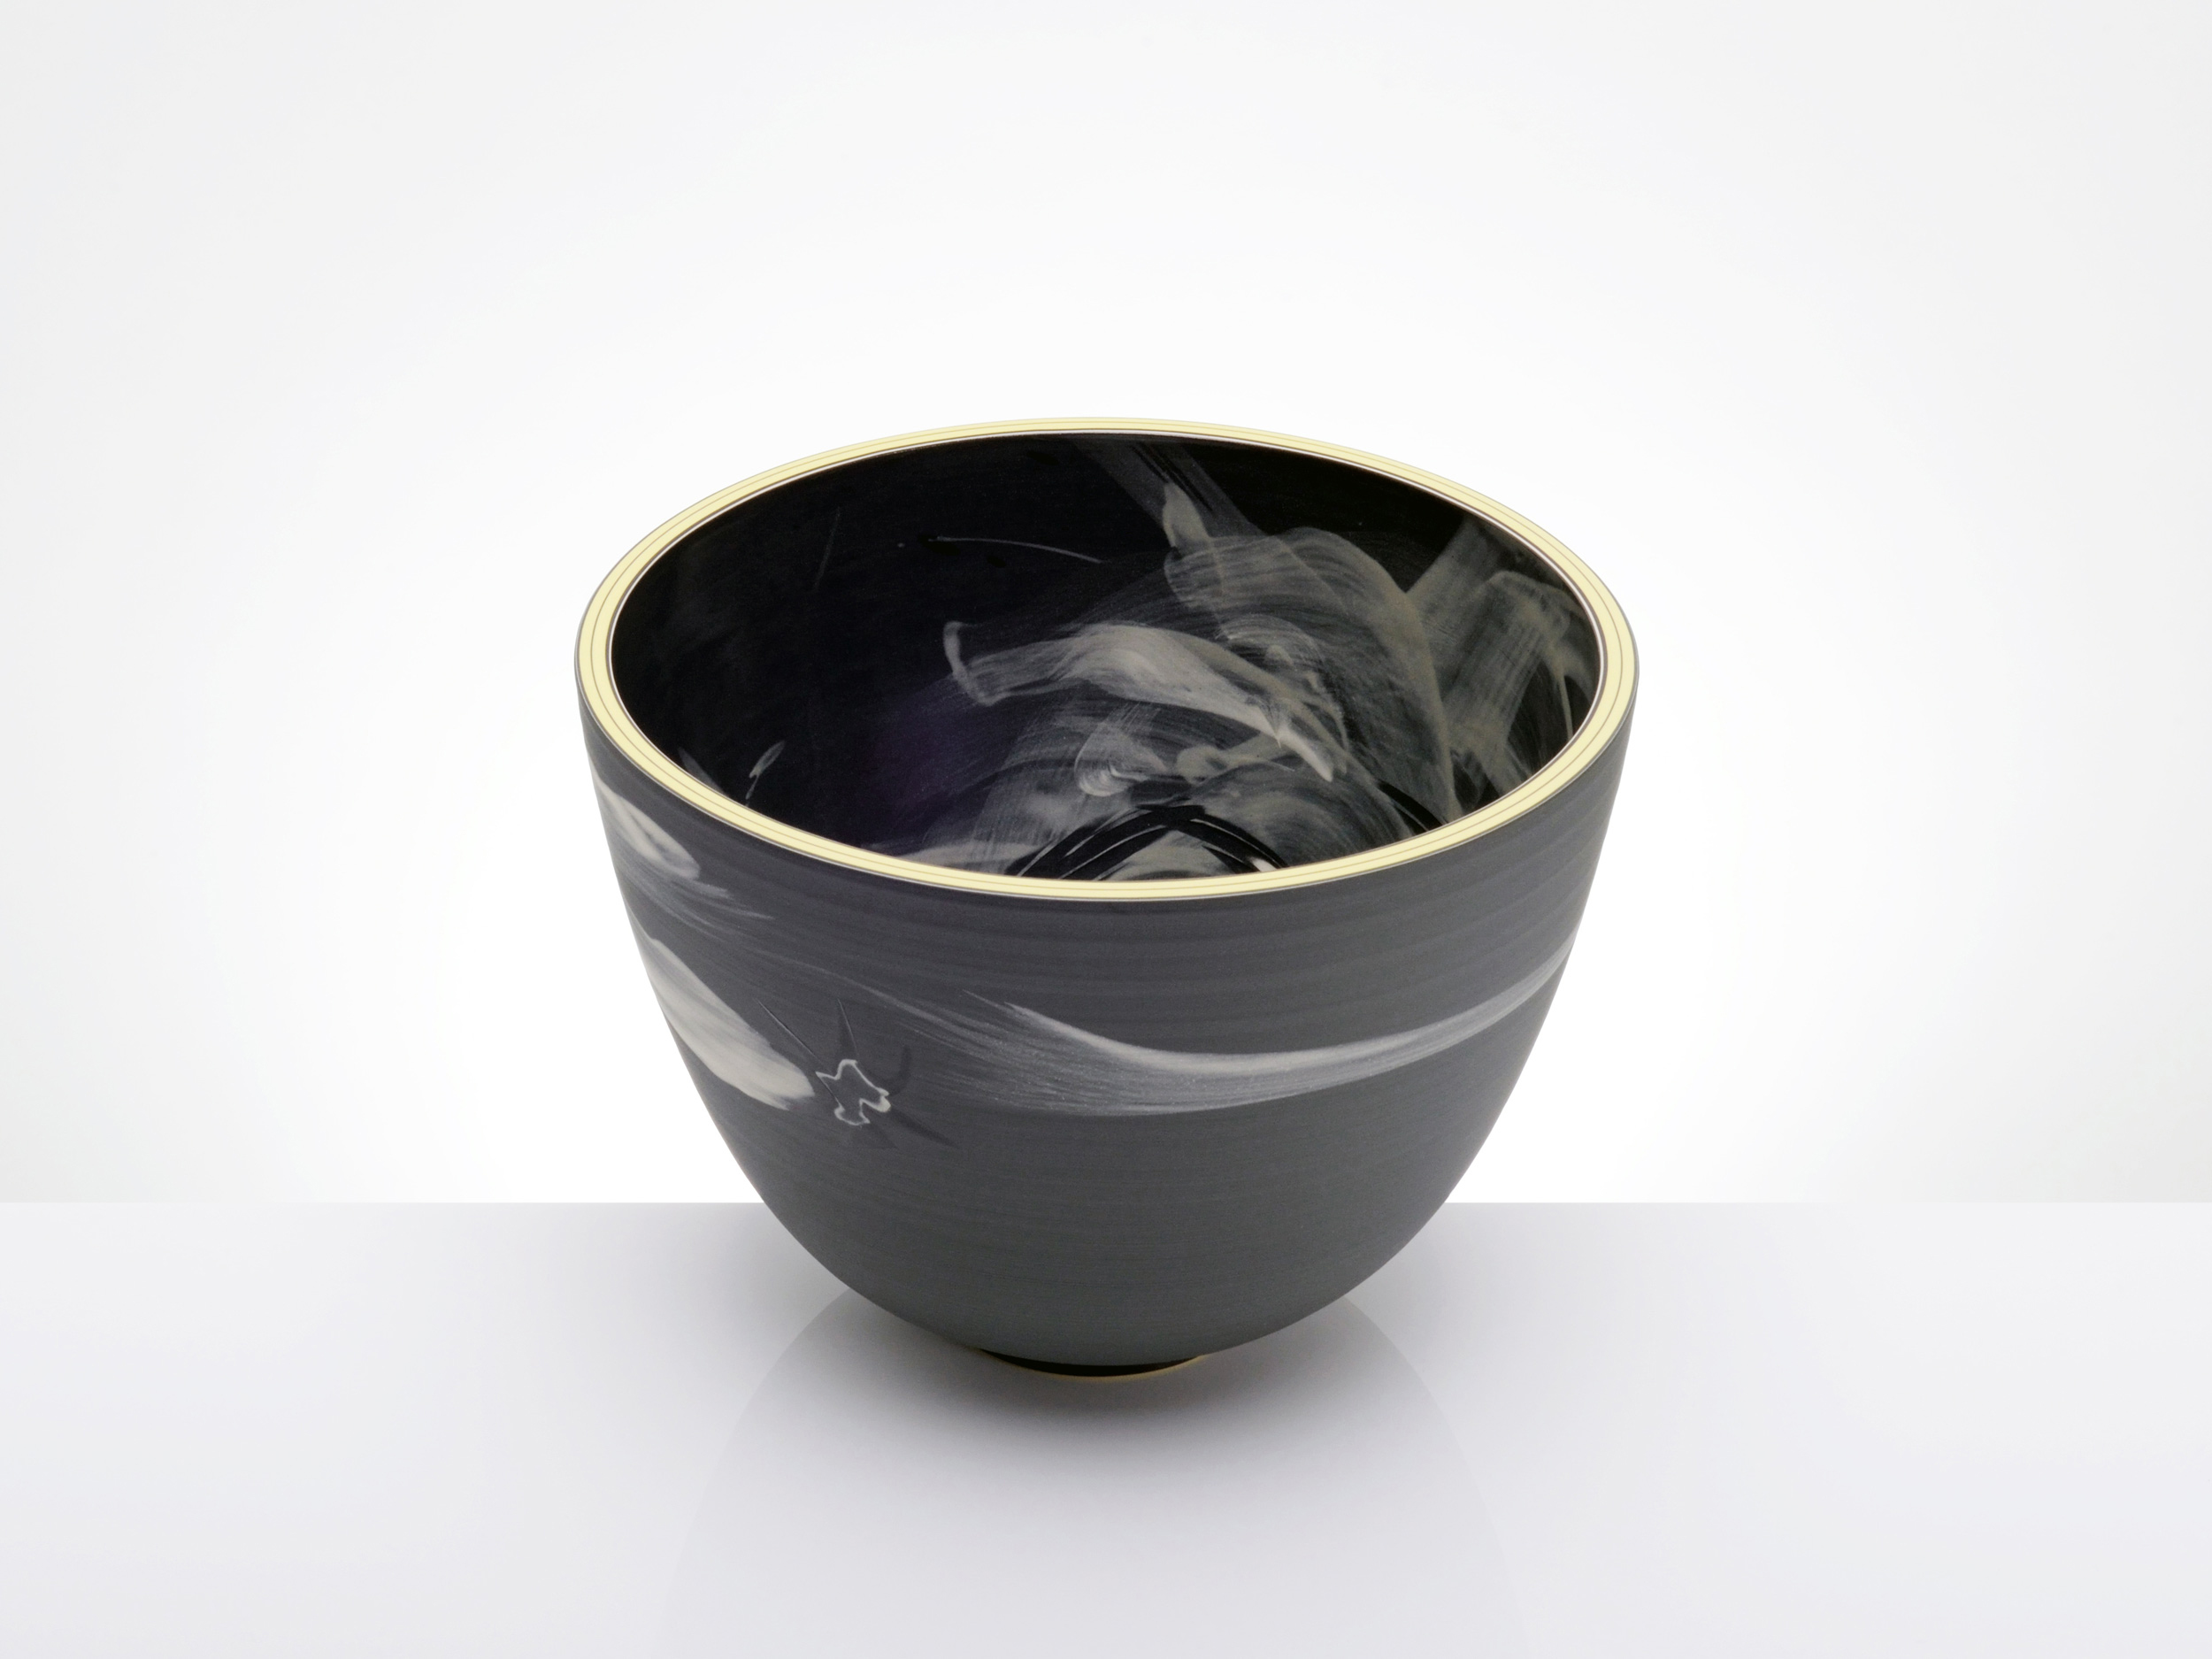 Shuriken Black Star Asteroid Bowl by Rowena Gilbert